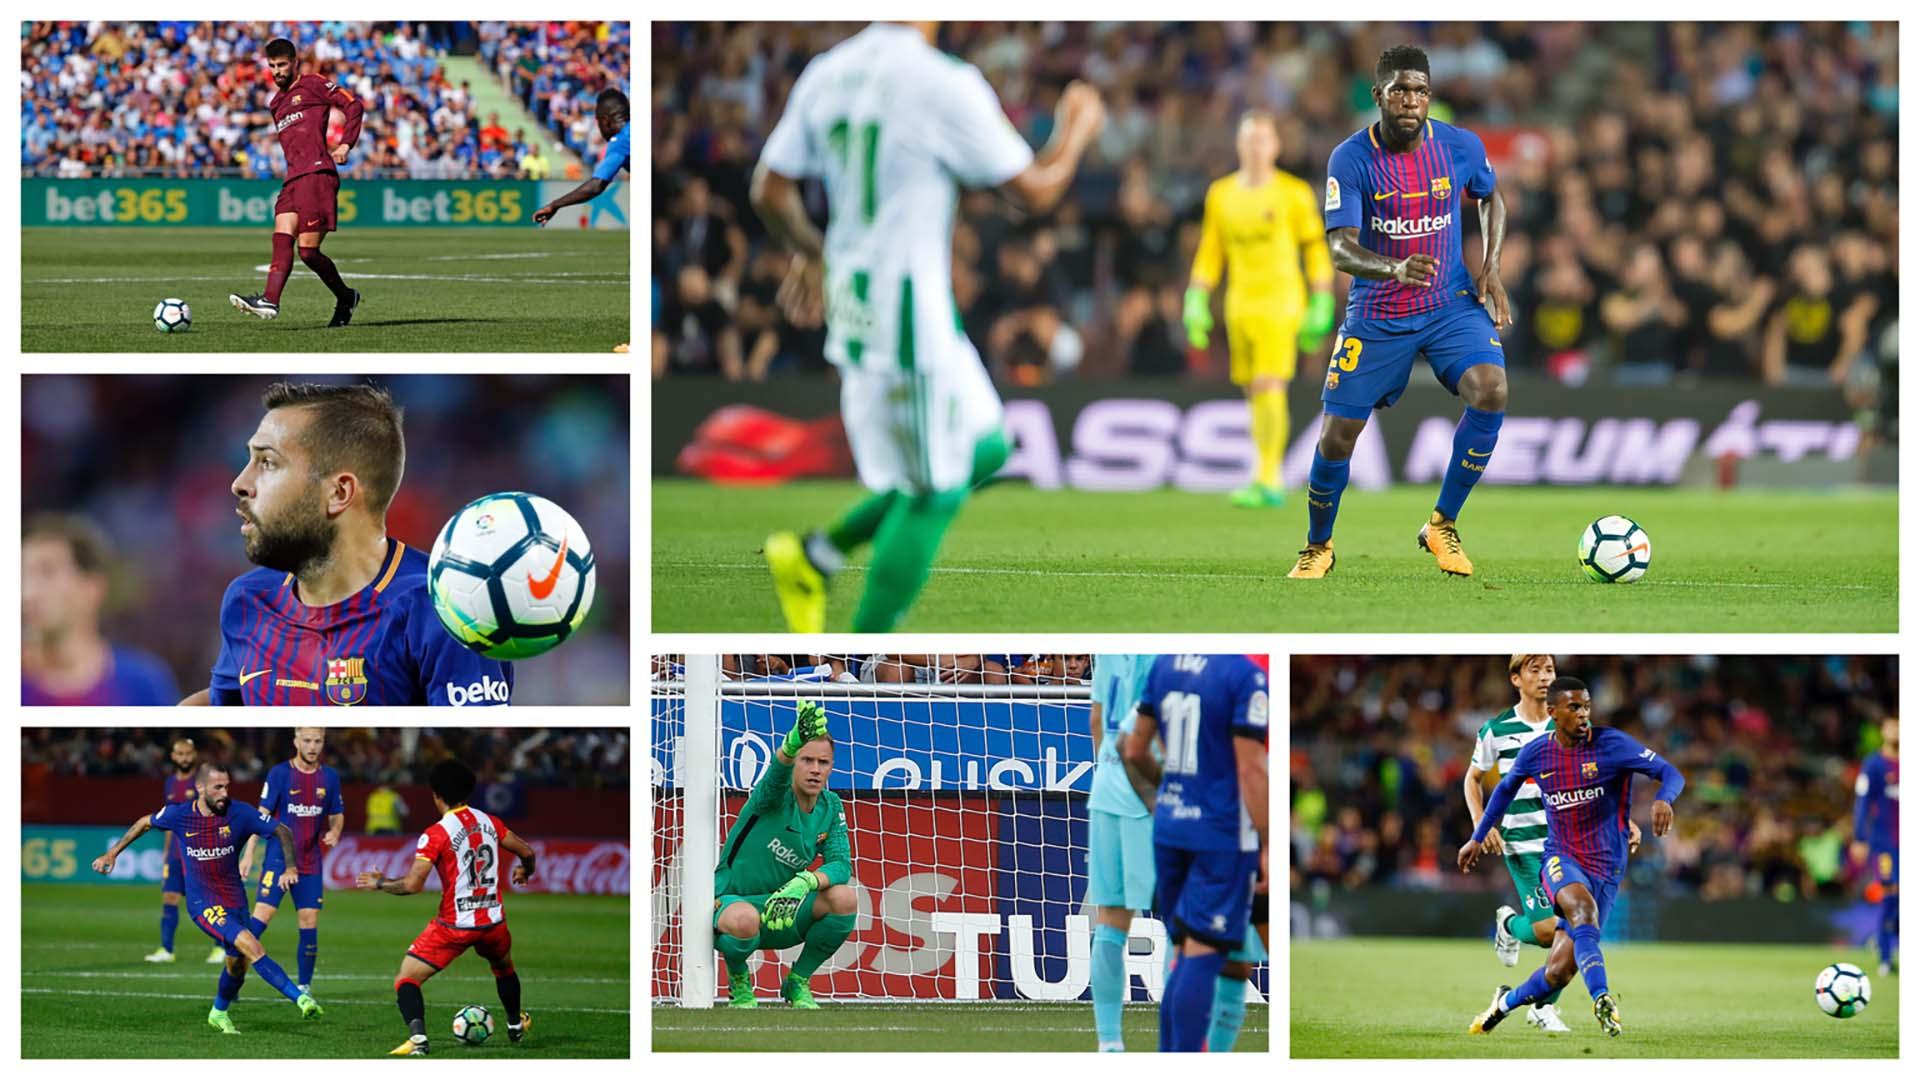 7️⃣ games 7️⃣ wins  5️⃣ shutouts  2️⃣ goals against Here's why...https://t.co/7nUTuoiPRP https://t.co/wpuWV9zo7L